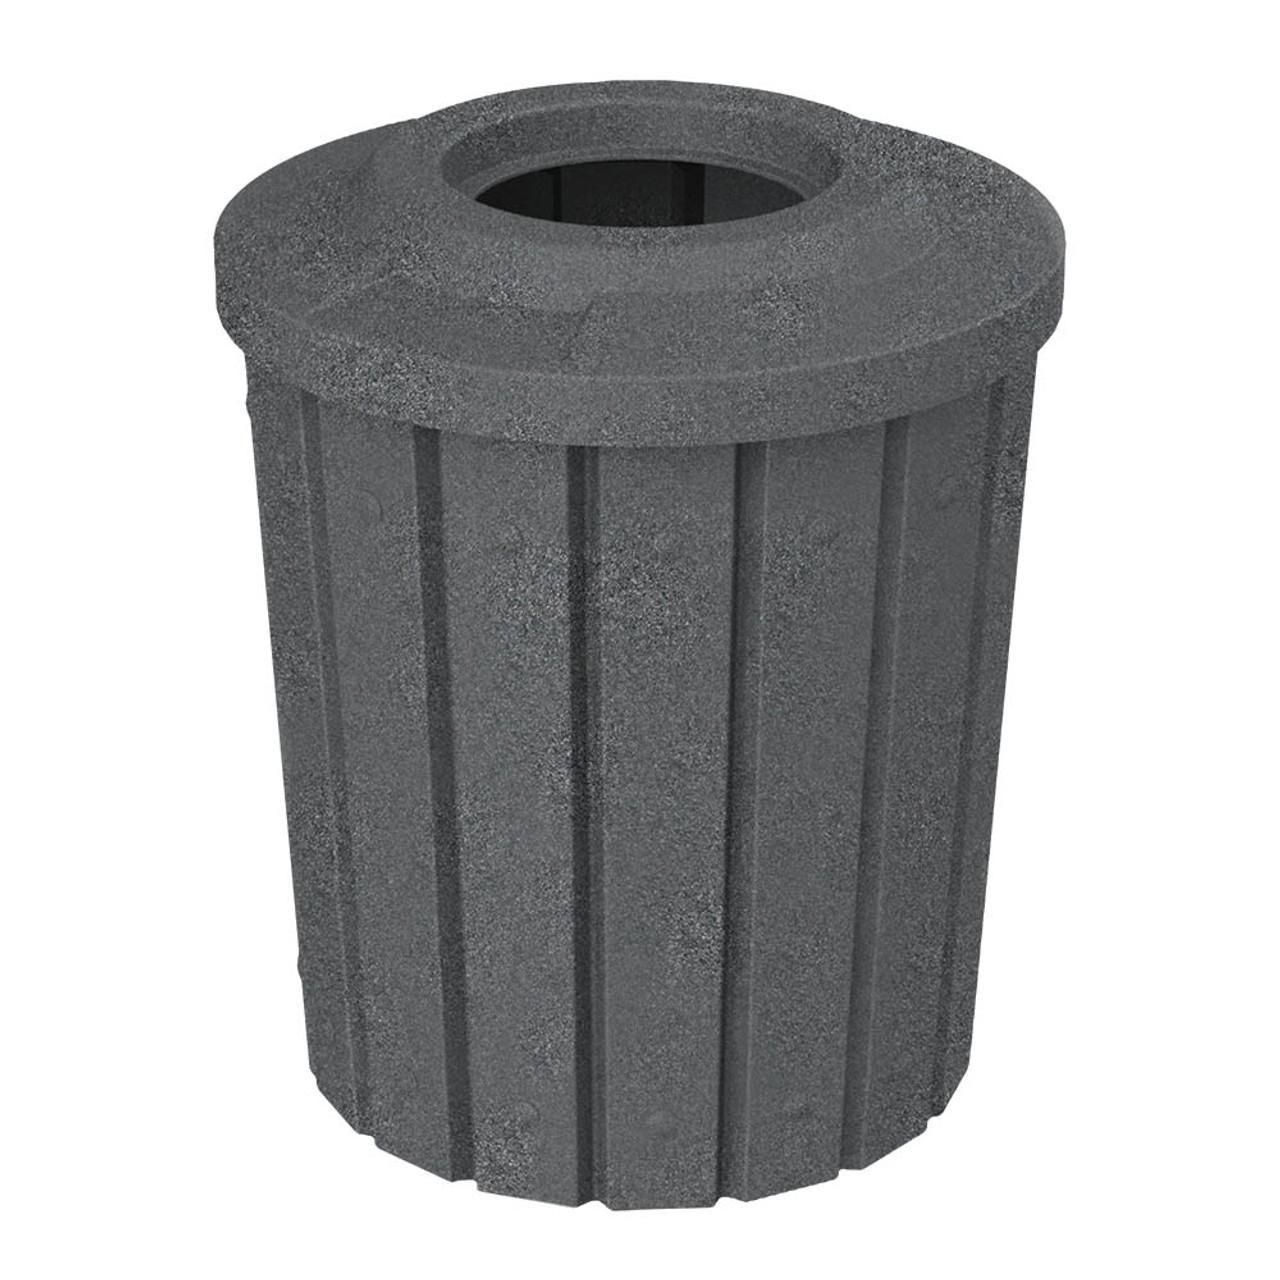 42 Gallon Kolor Can Heavy Duty Trash Receptacle S8281A DARK GRANITE